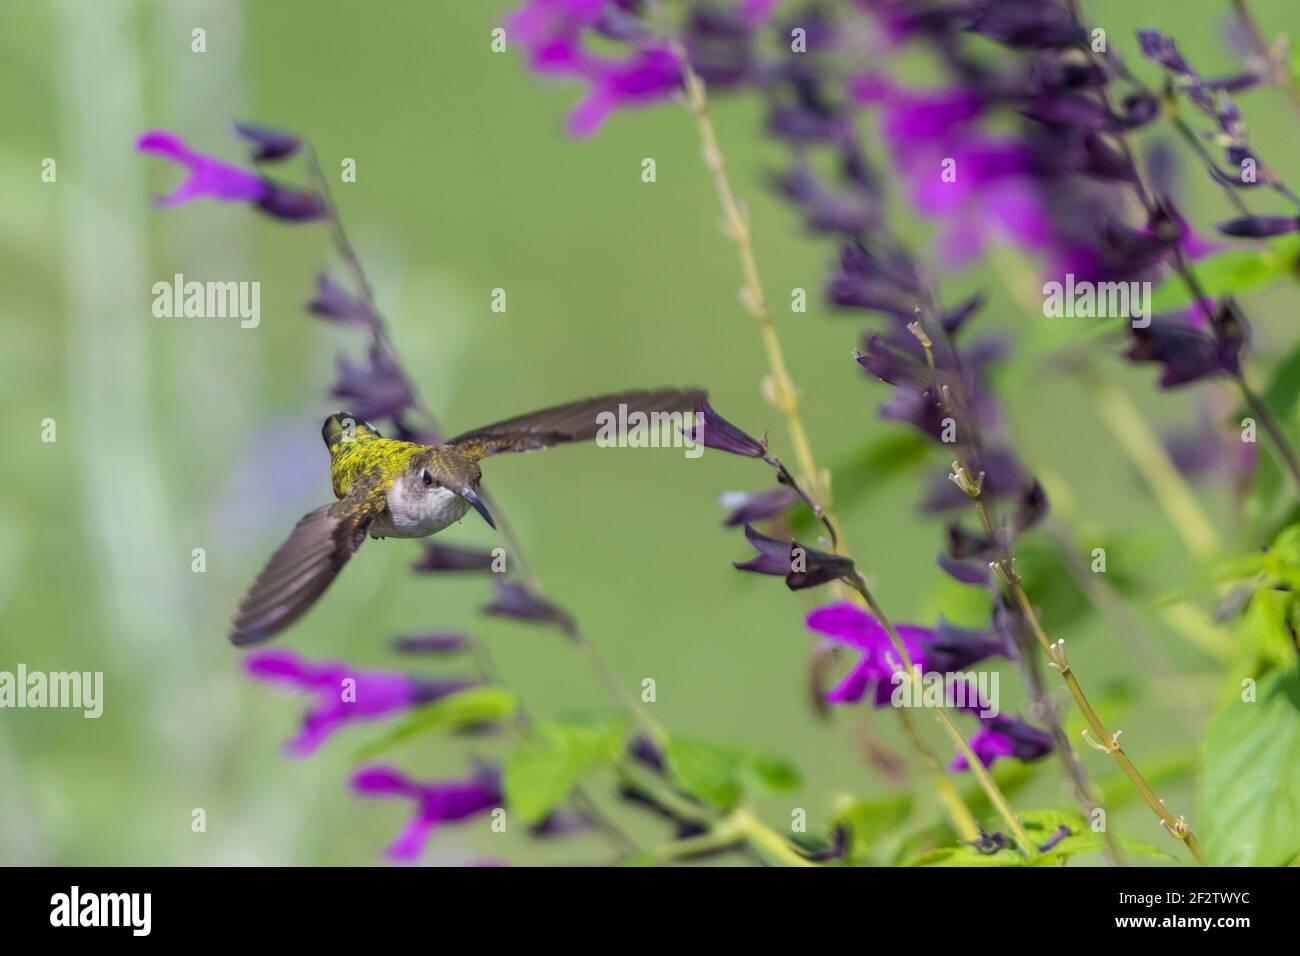 01162-16514 Hummingbird de garganta rubí (Archilochus colubris) en Salvia 'Purple and Bloom' (Salvia guaranitica) Marion Co. IL Foto de stock